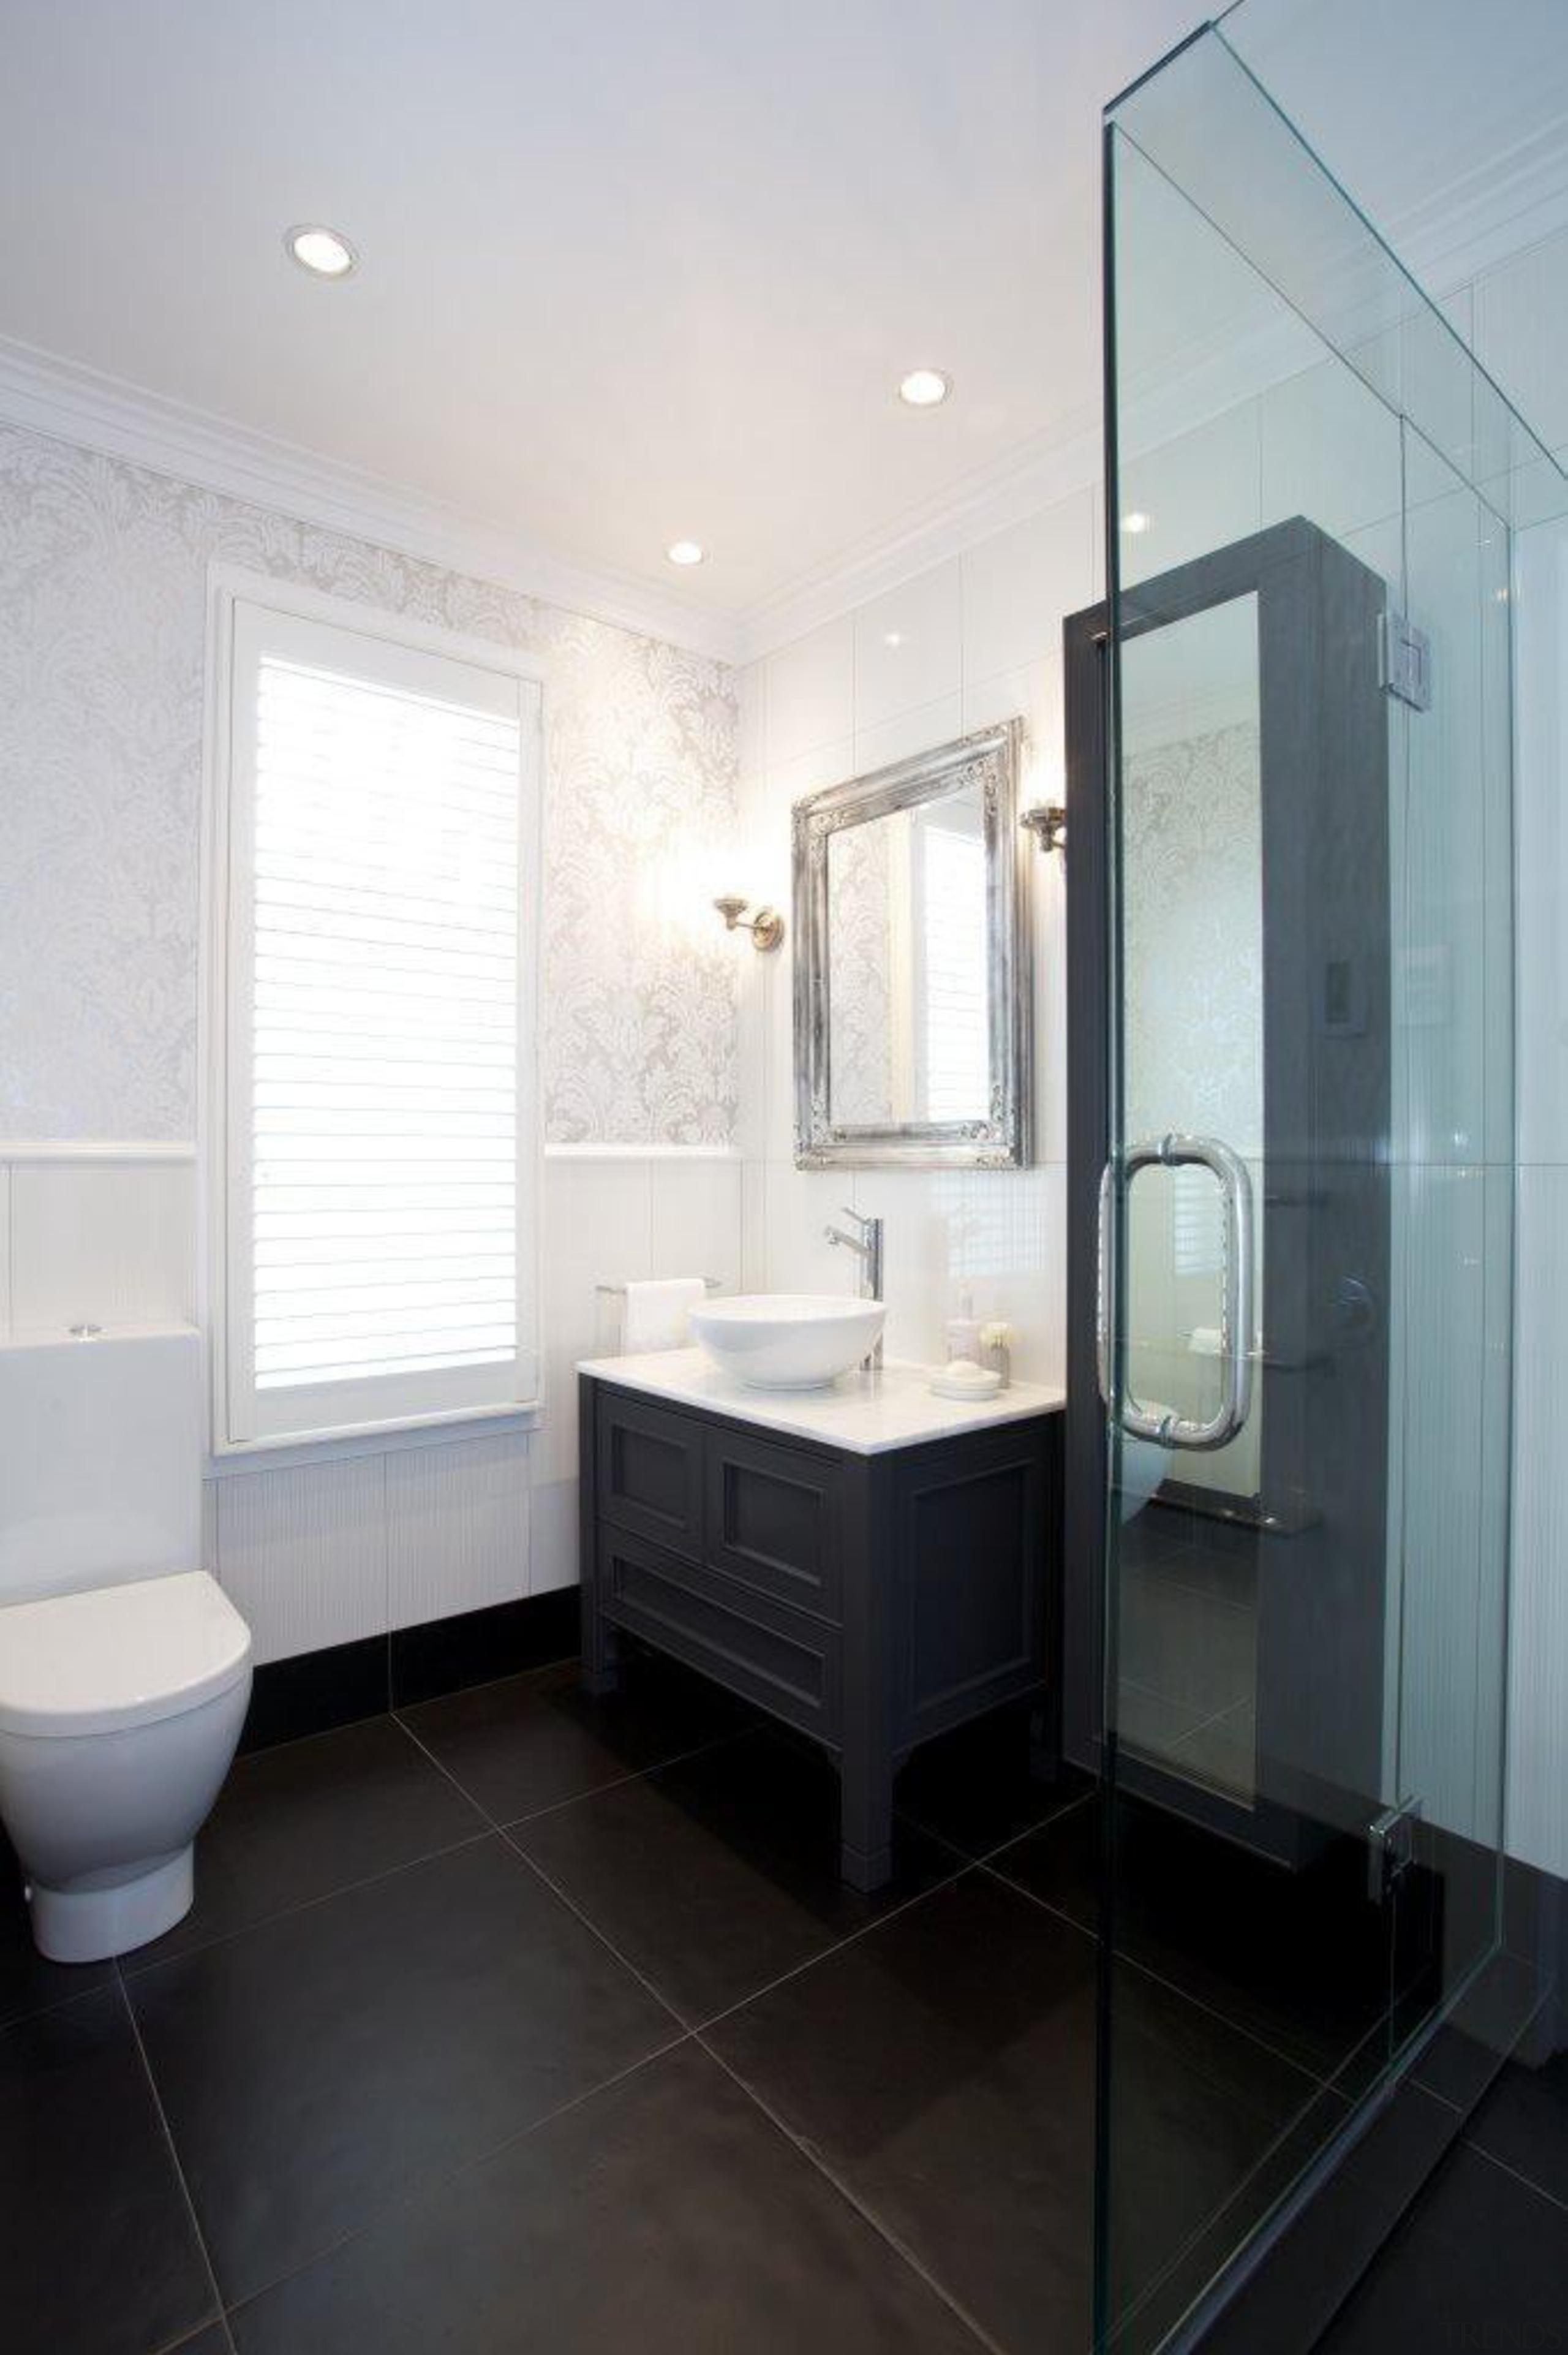 classicalchildrens bathroom.jpg - classicalchildrens_bathroom.jpg - bathroom | floor bathroom, floor, home, interior design, real estate, room, gray, black, white